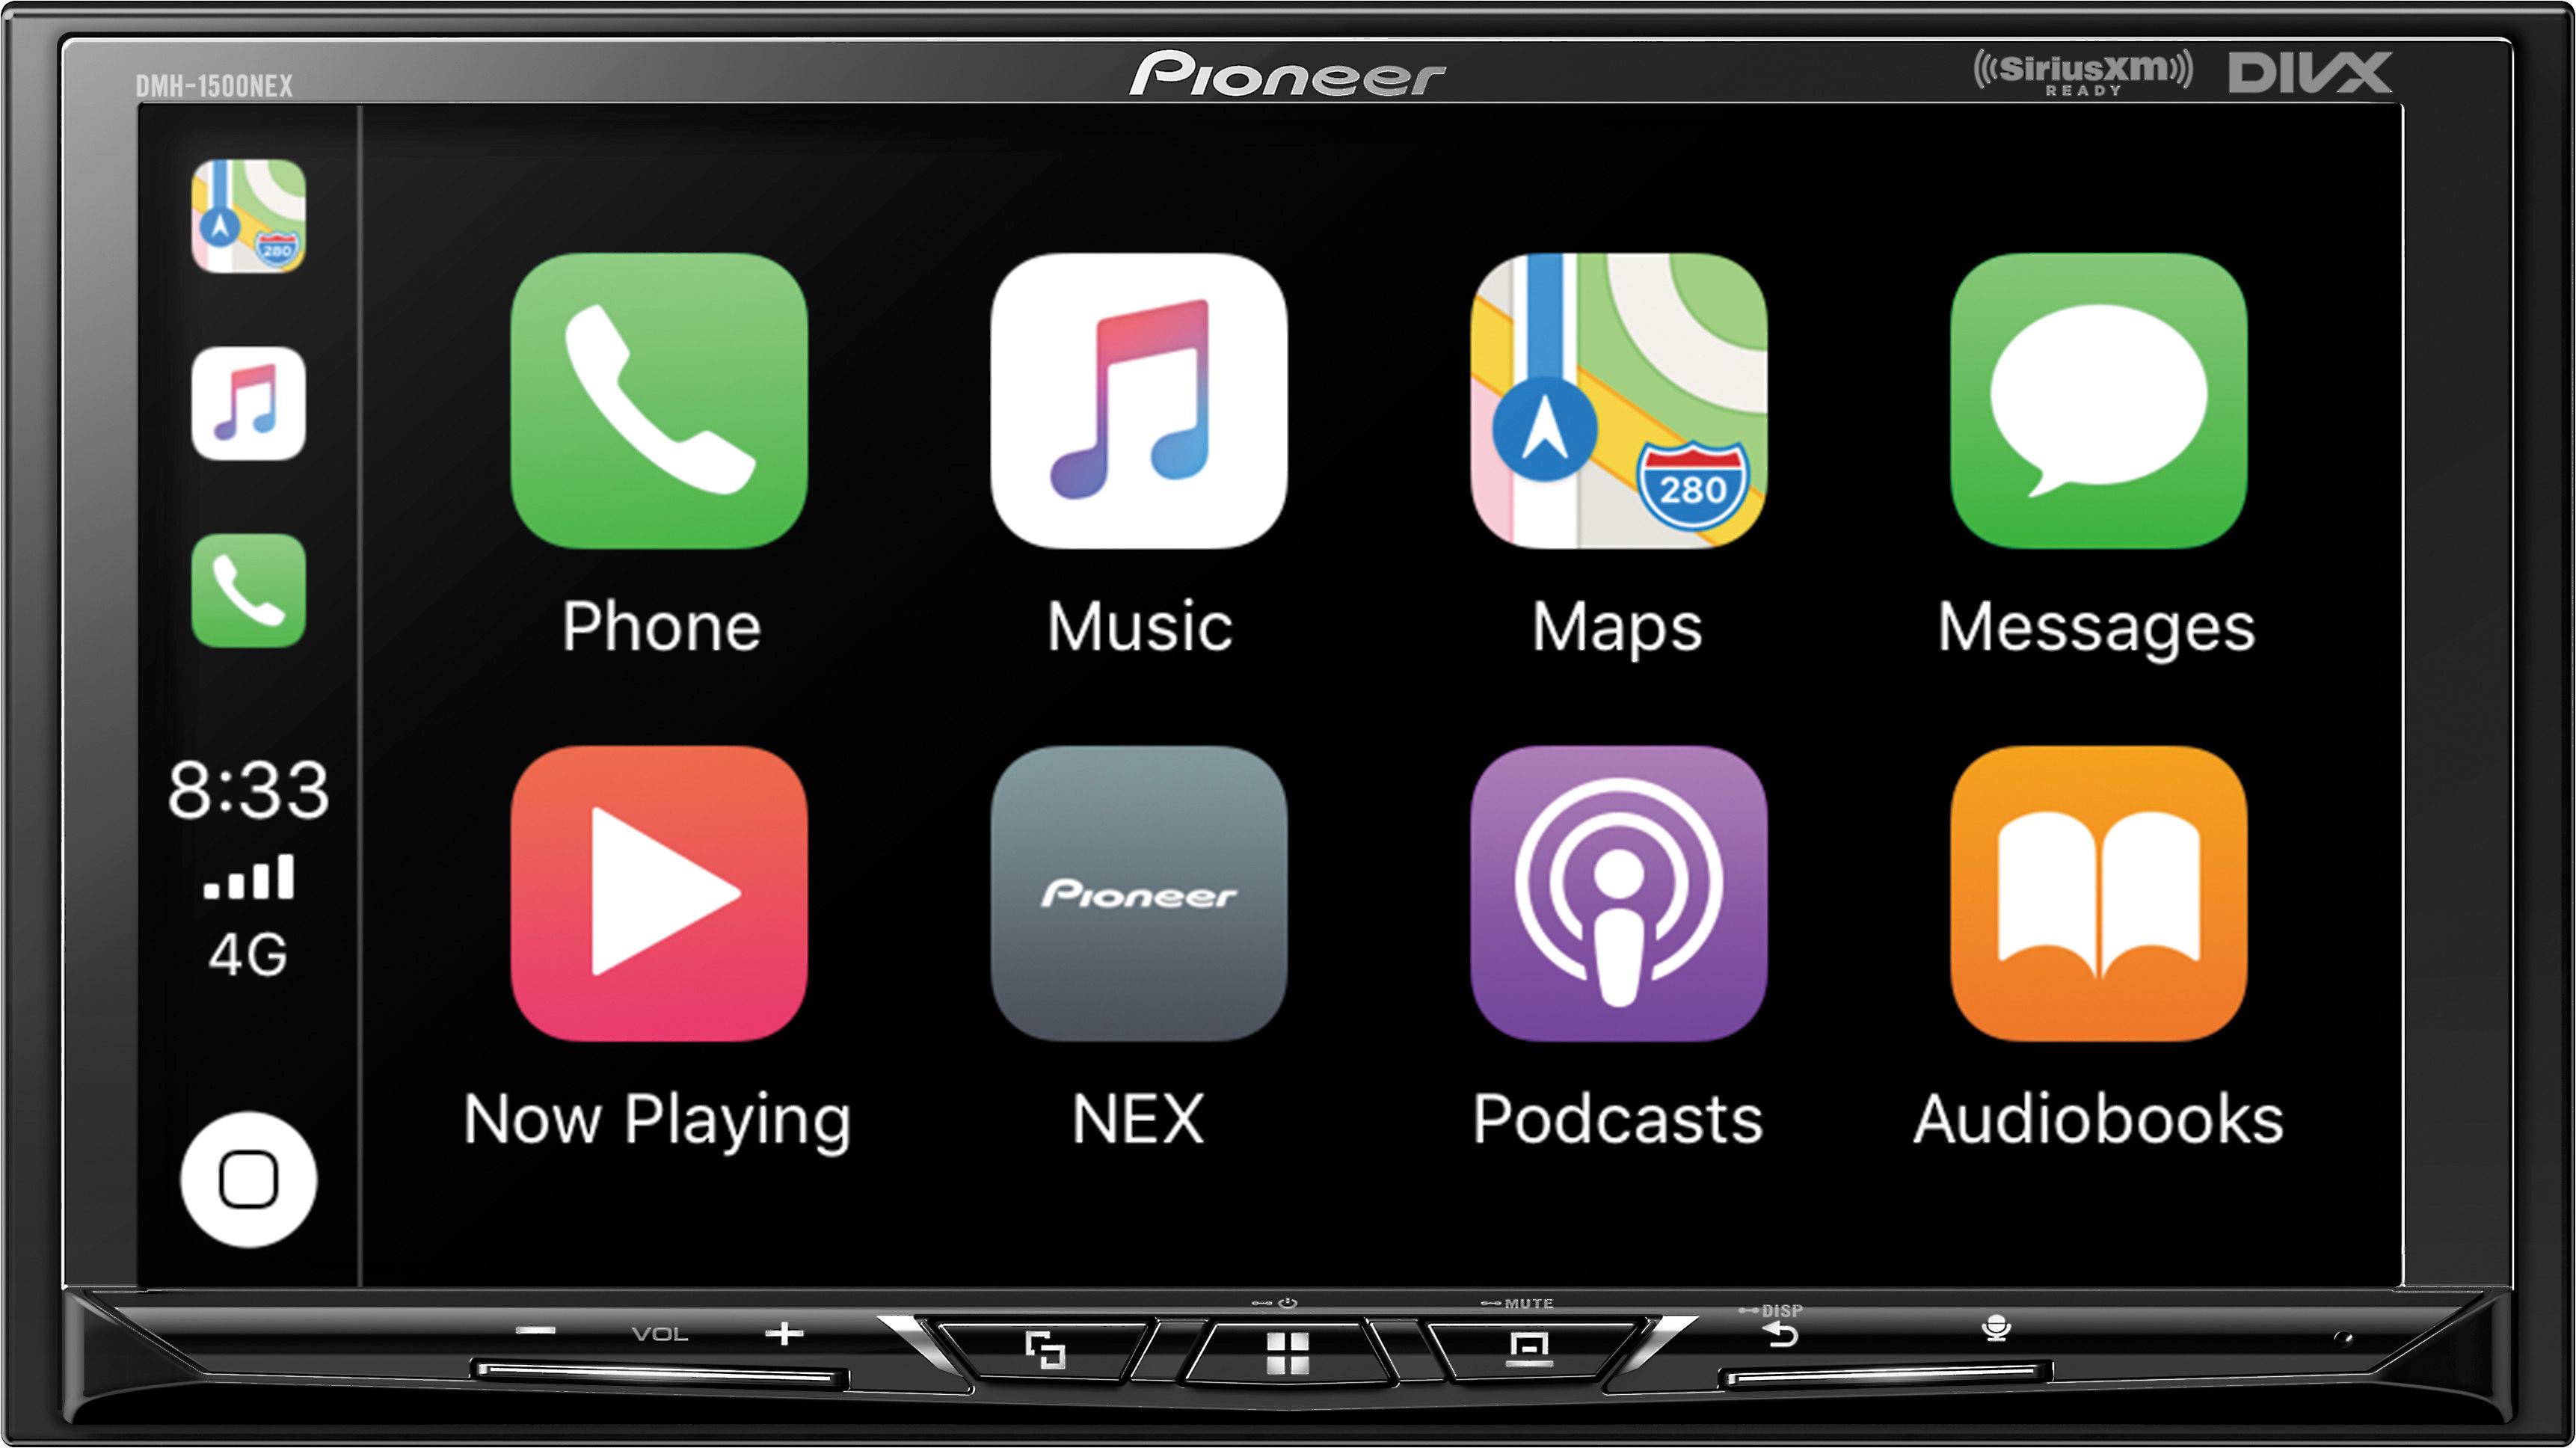 Pioneer Dmh 1500nex Digital Multimedia Receiver Does Not Play Cds At Crutchfield